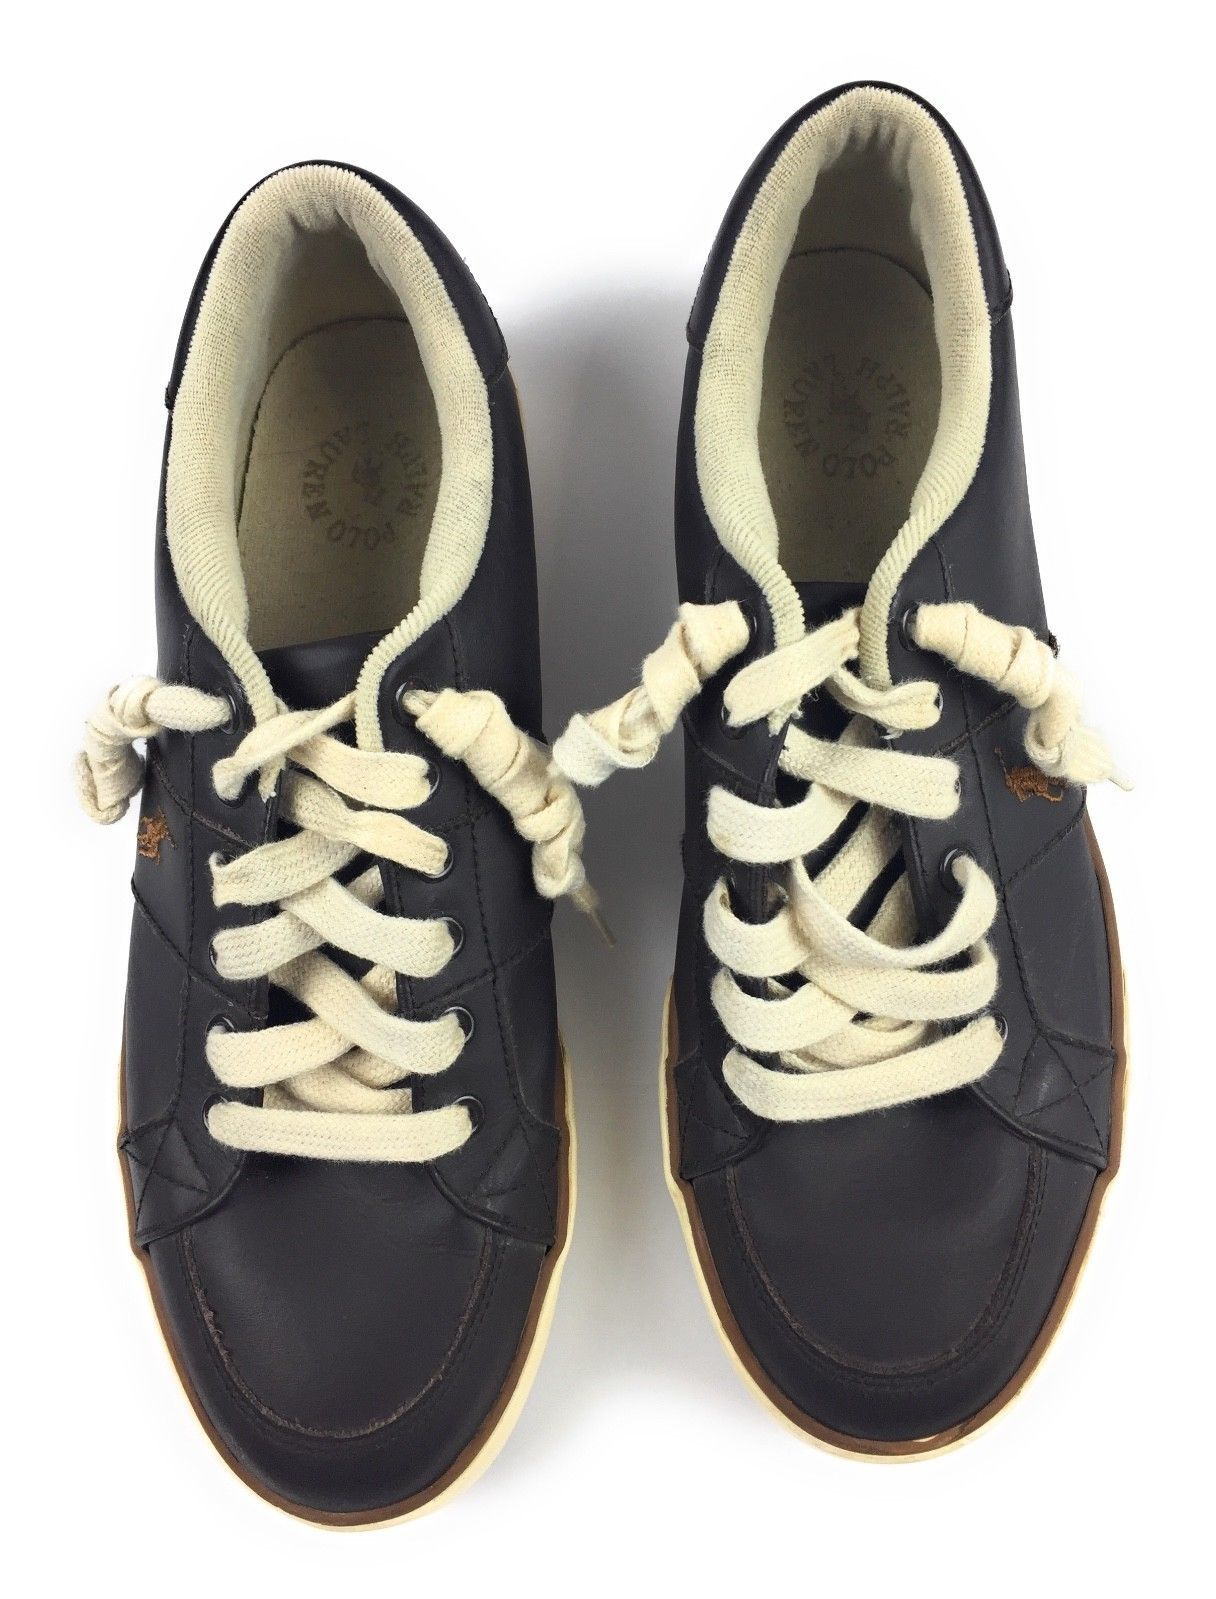 Polo Ralph Lauren Hanford Dark Brown Leather Deck Boat Sneakers Shoes Men's 9.5D